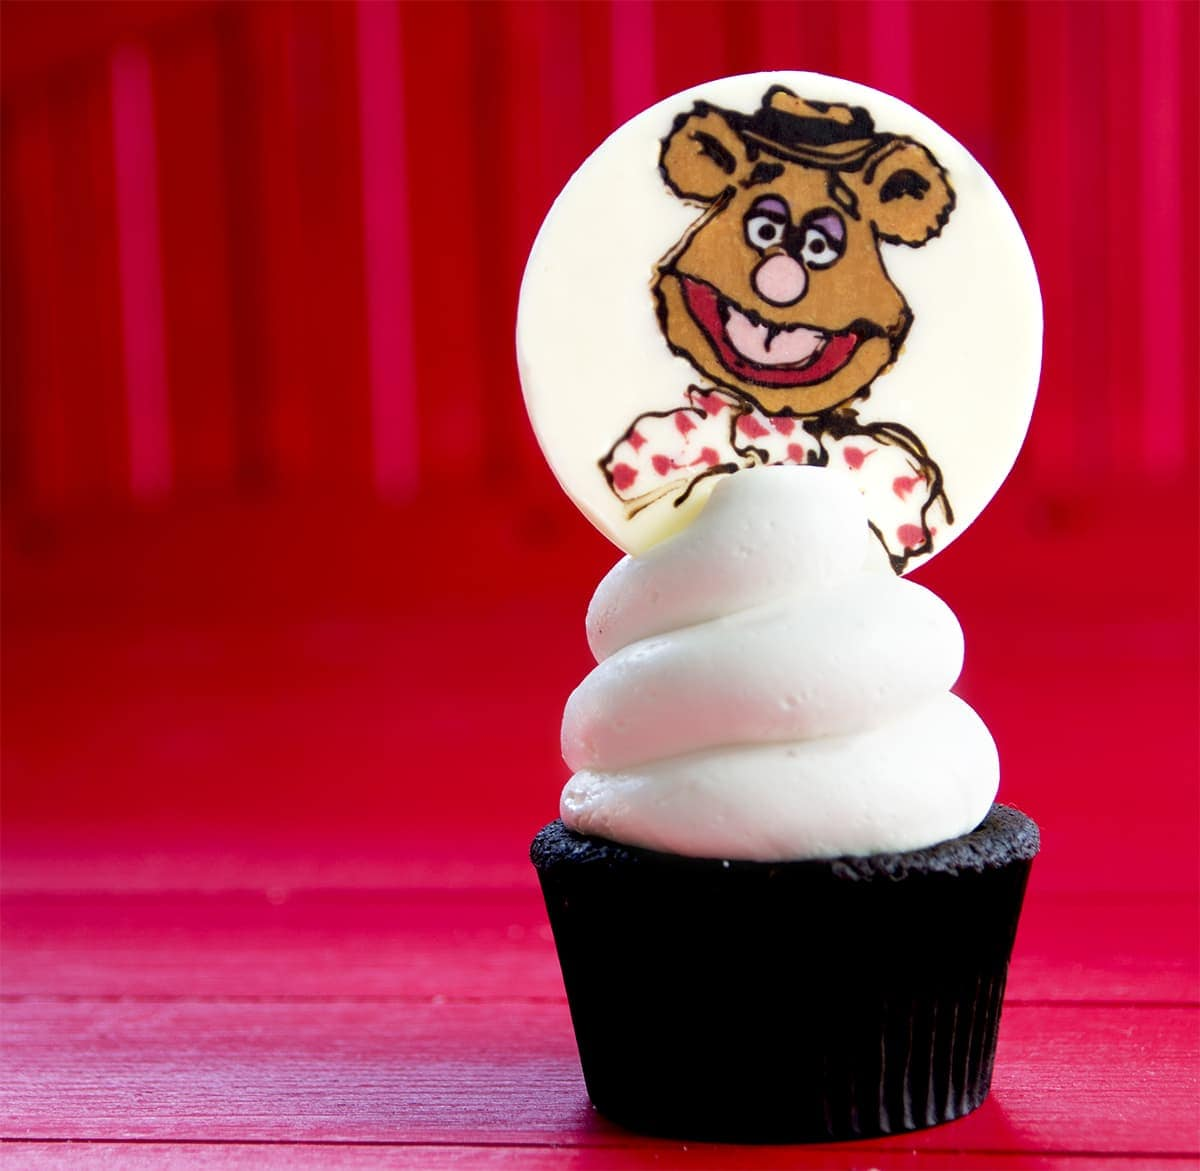 Fozzy Square Web - Muppets Cupcakes <br/>& Easy Vanilla Buttercream